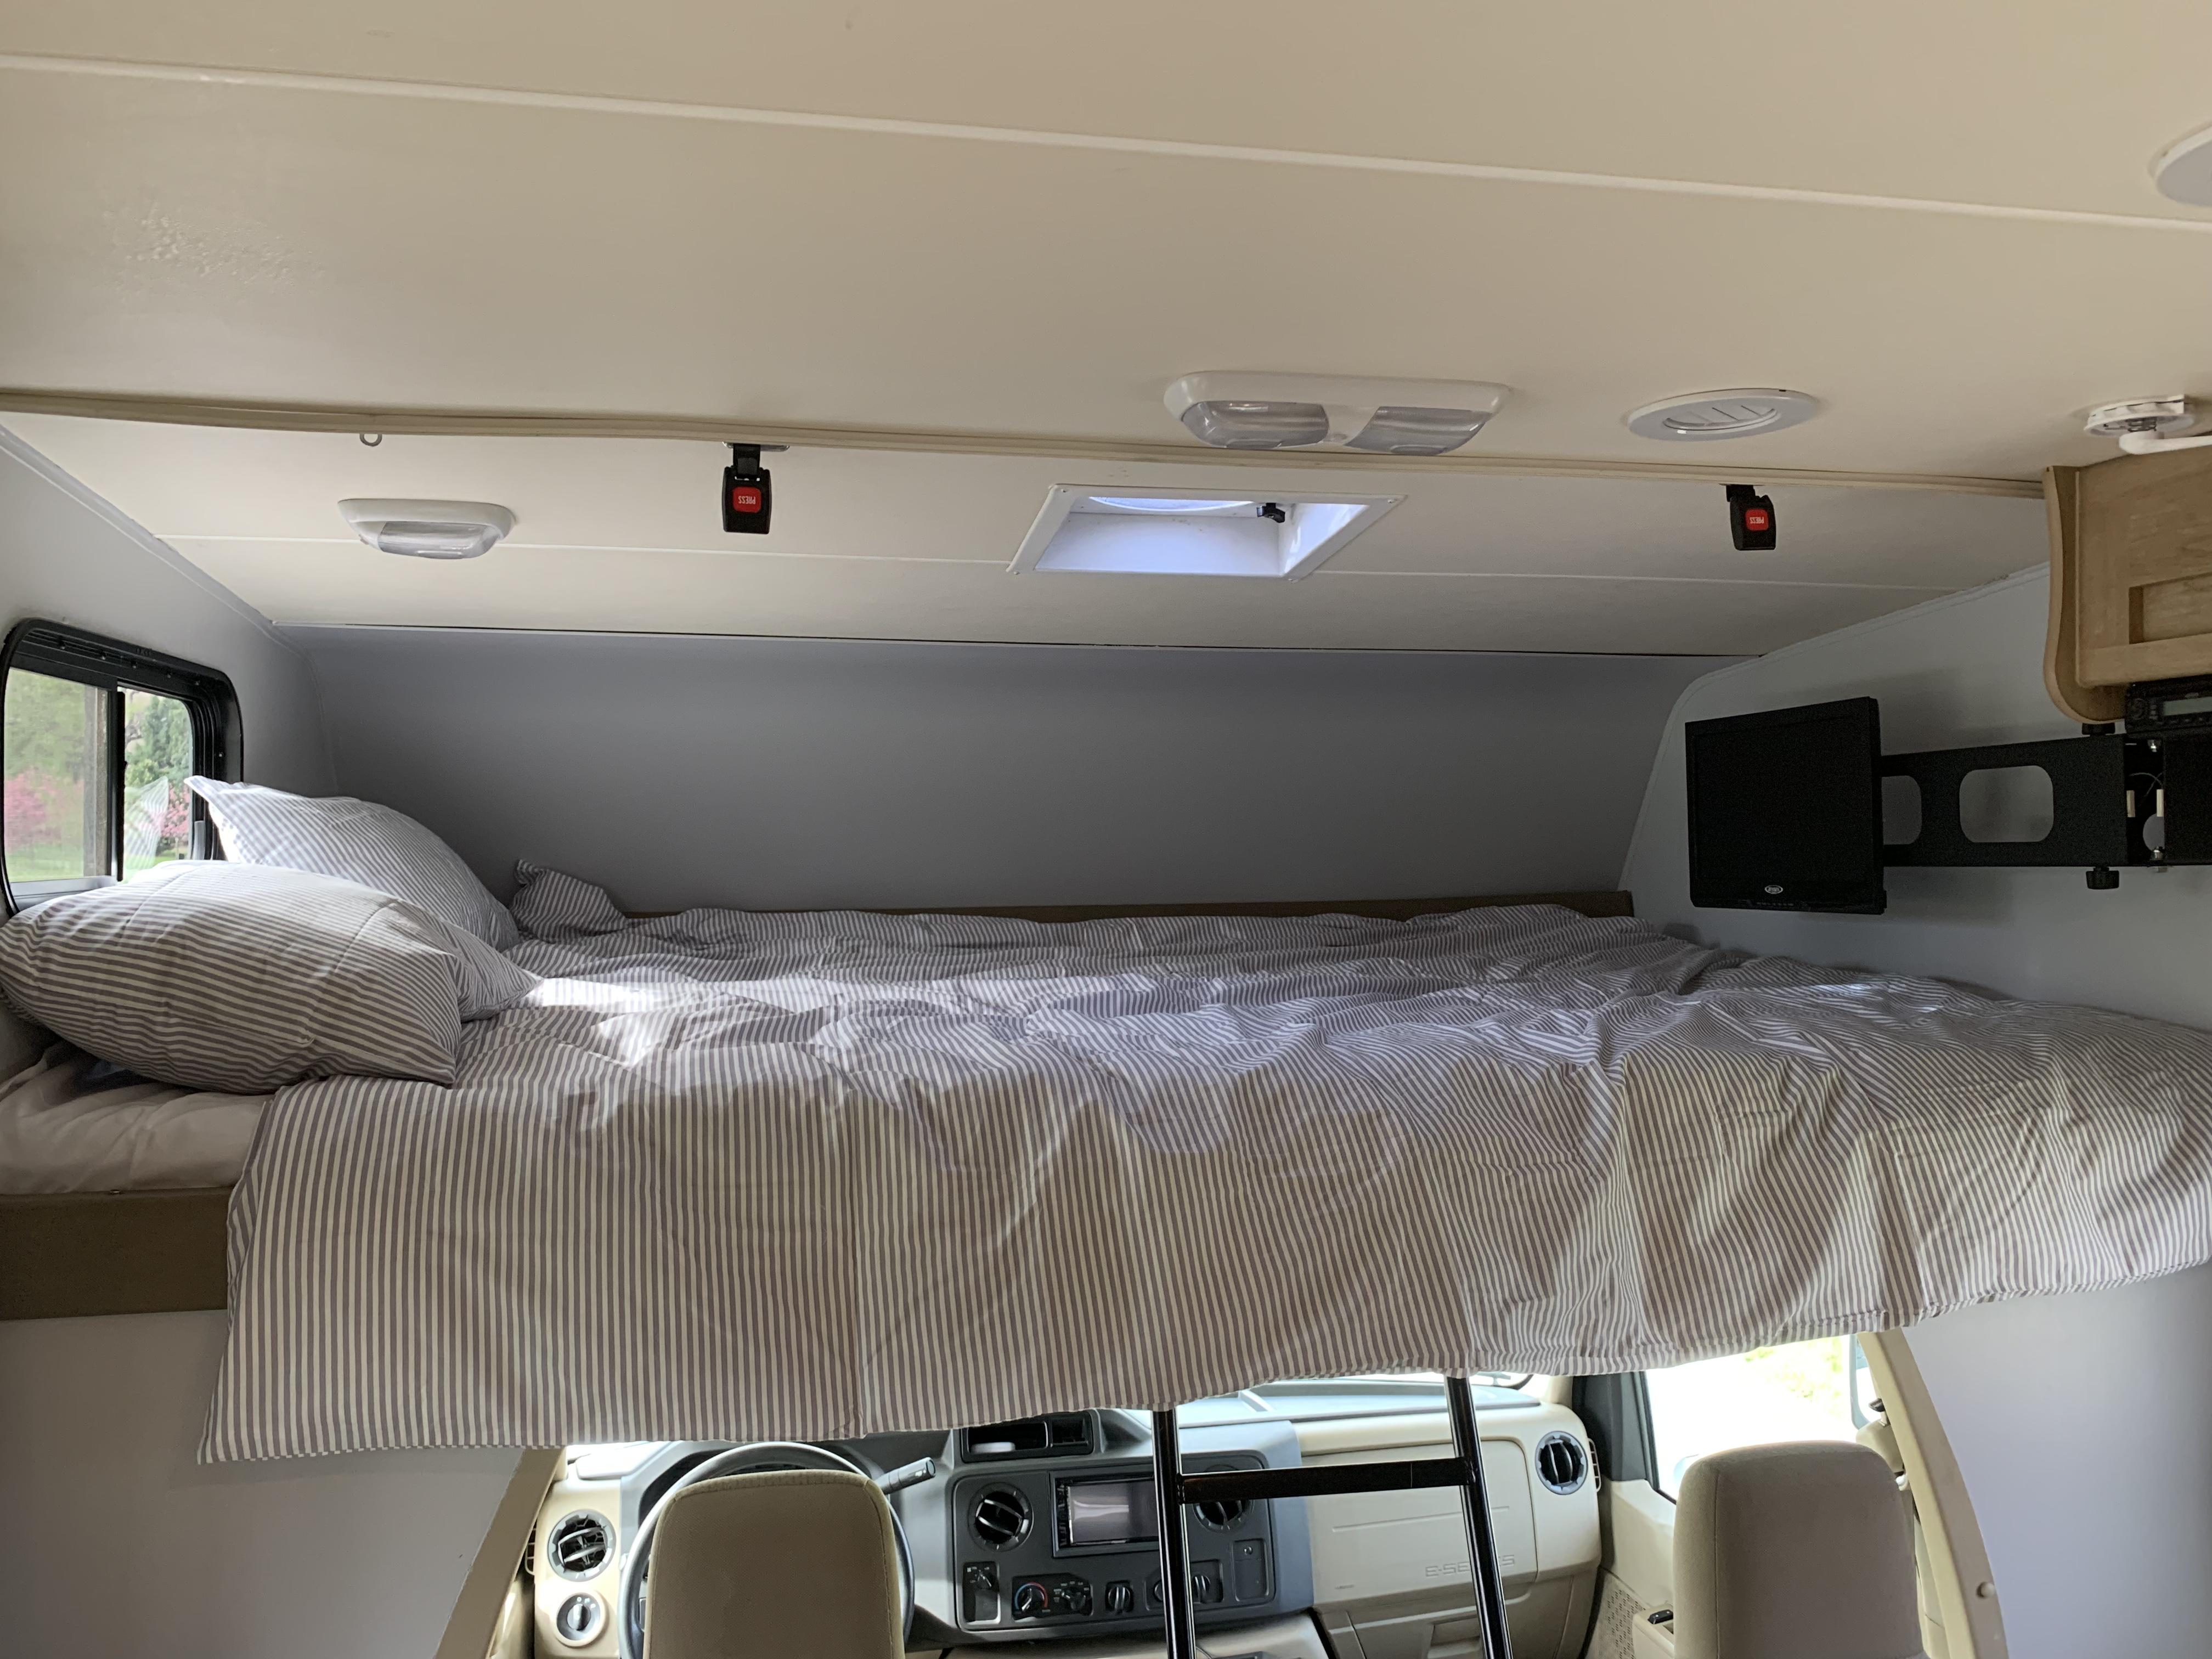 Overhead bunk. Coachmen Freelander 2015